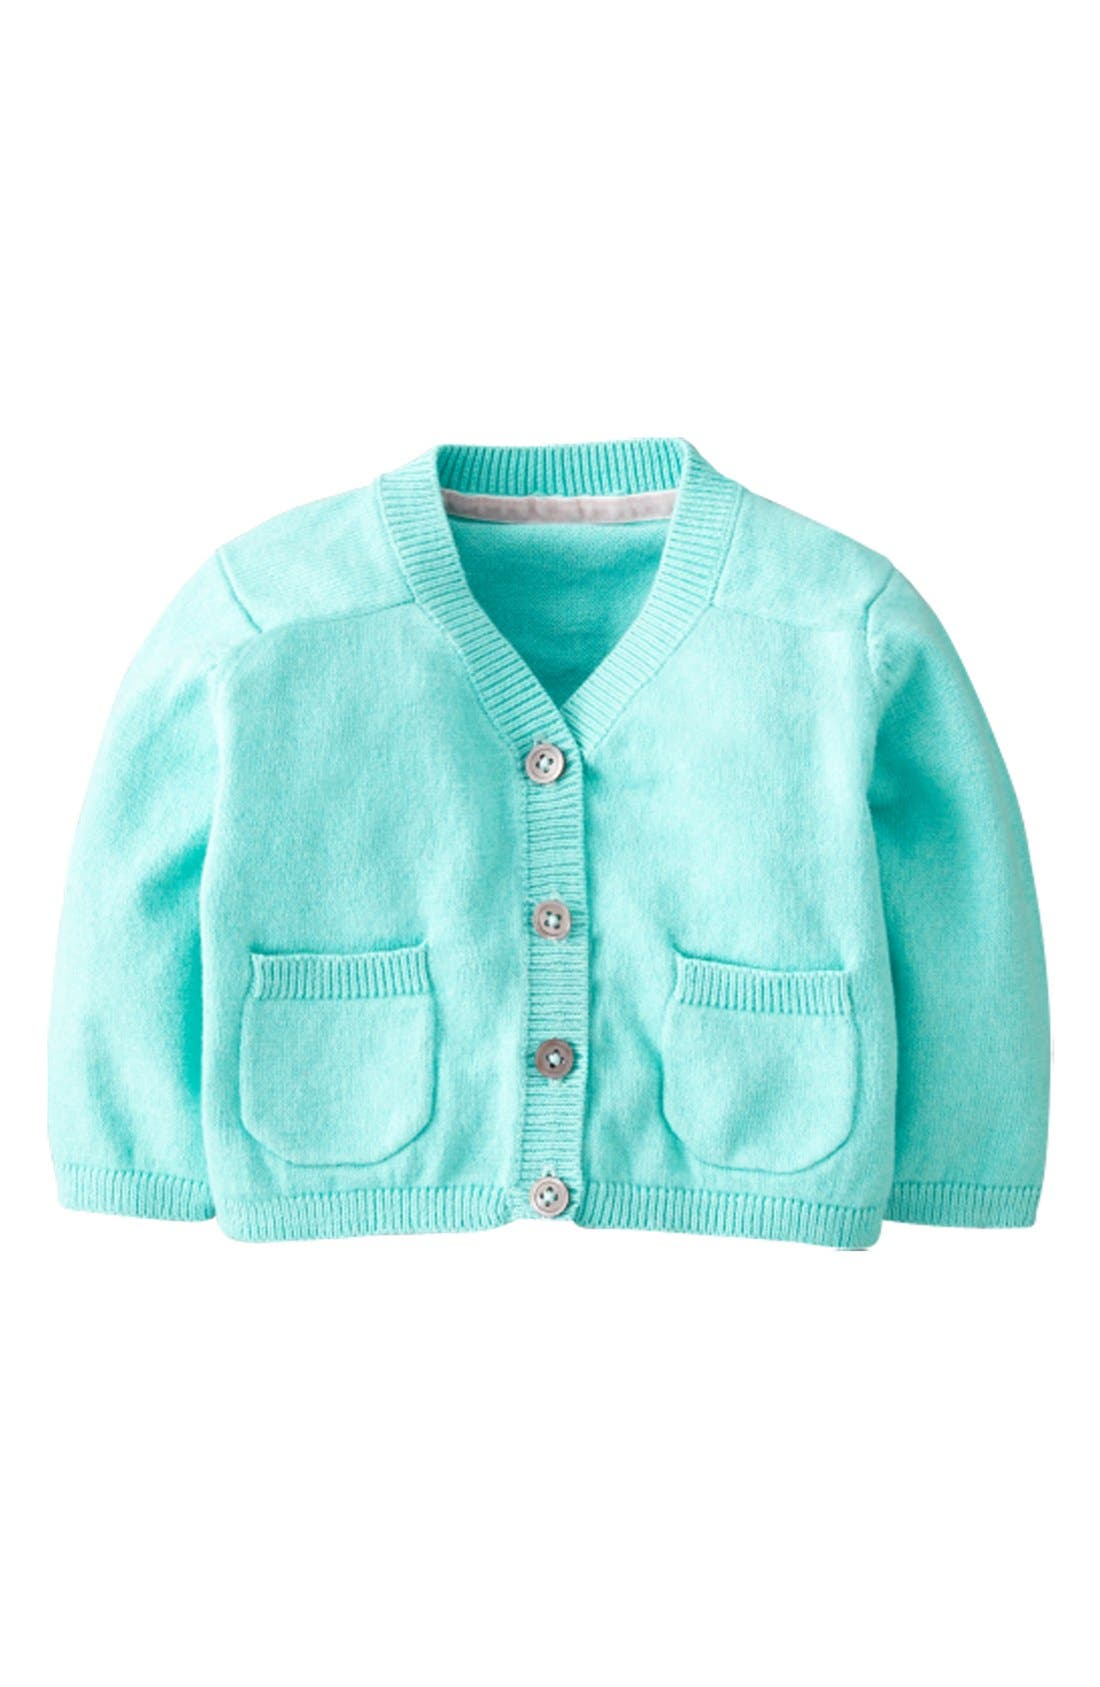 Alternate Image 1 Selected - Mini Boden 'Favorite' Cardigan (Baby Girls)